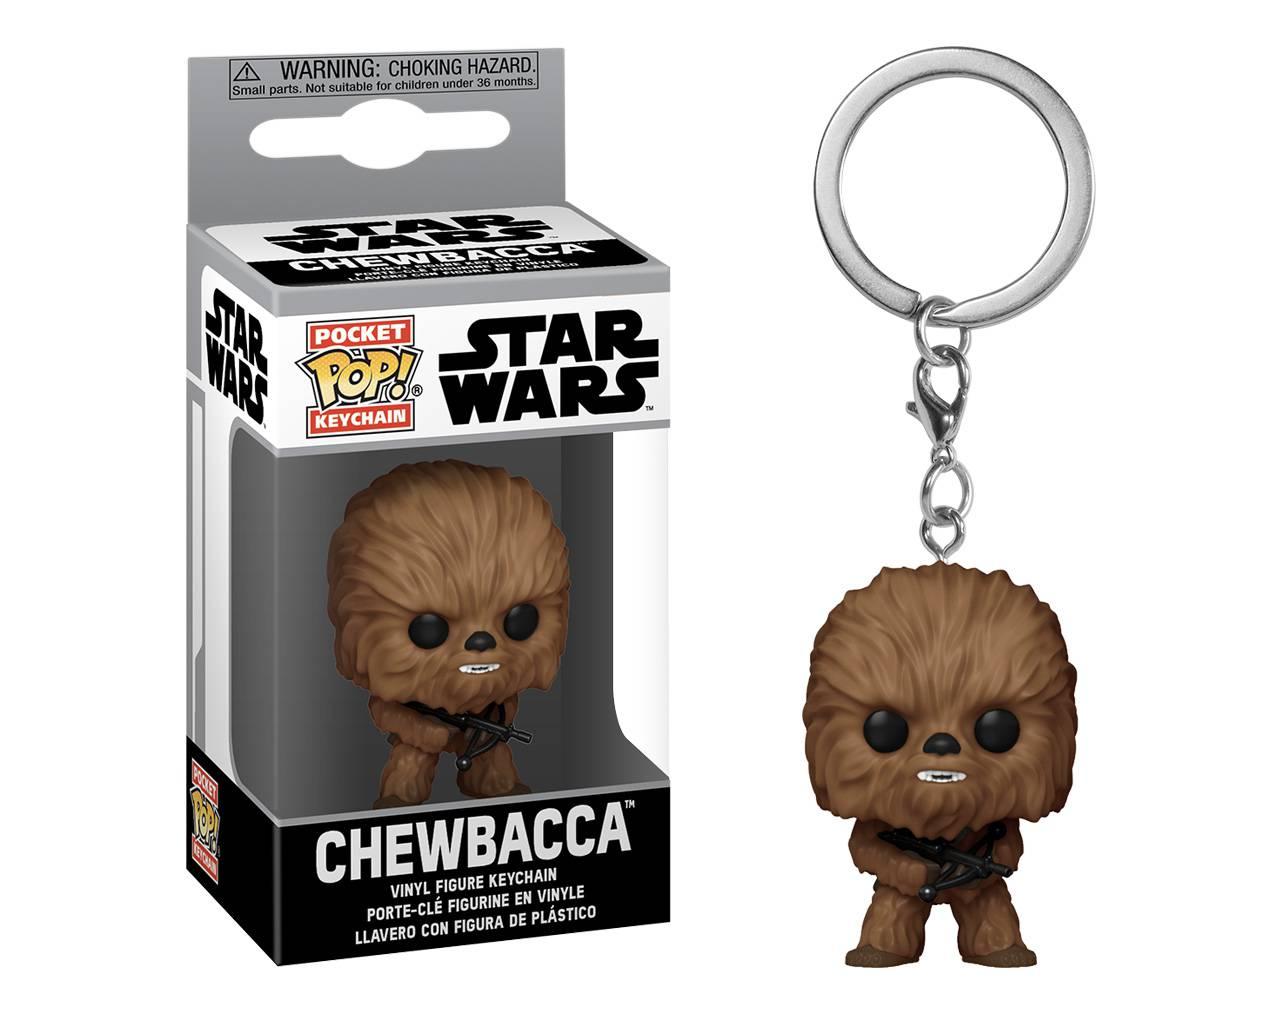 Chewbacca (Llavero) Pop! Vinyl